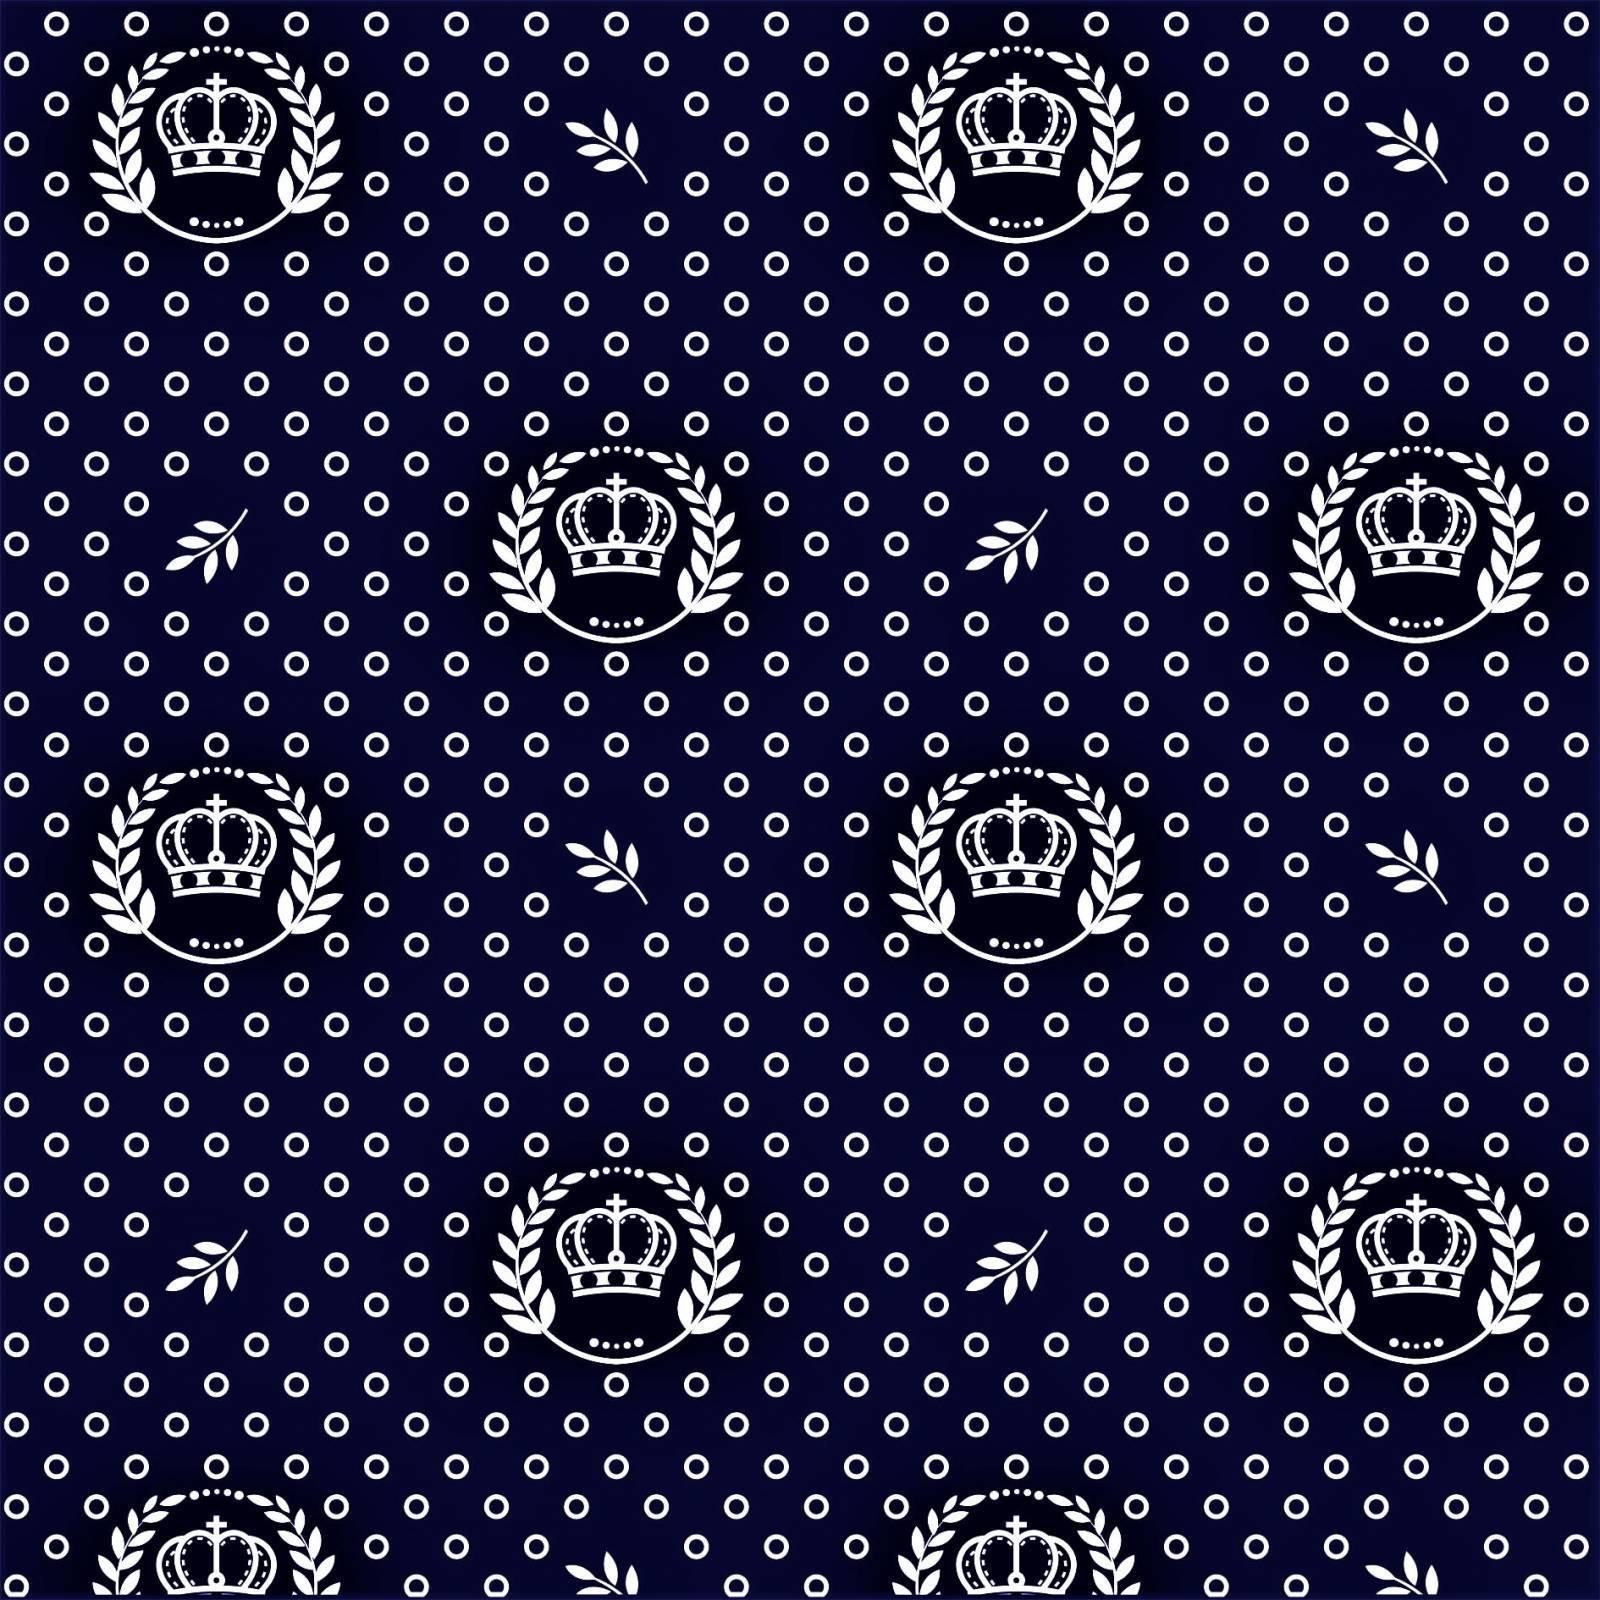 Coroas fundo azul marinho Ref.1169 cor 602 Peripan - Armarinhos Nodari